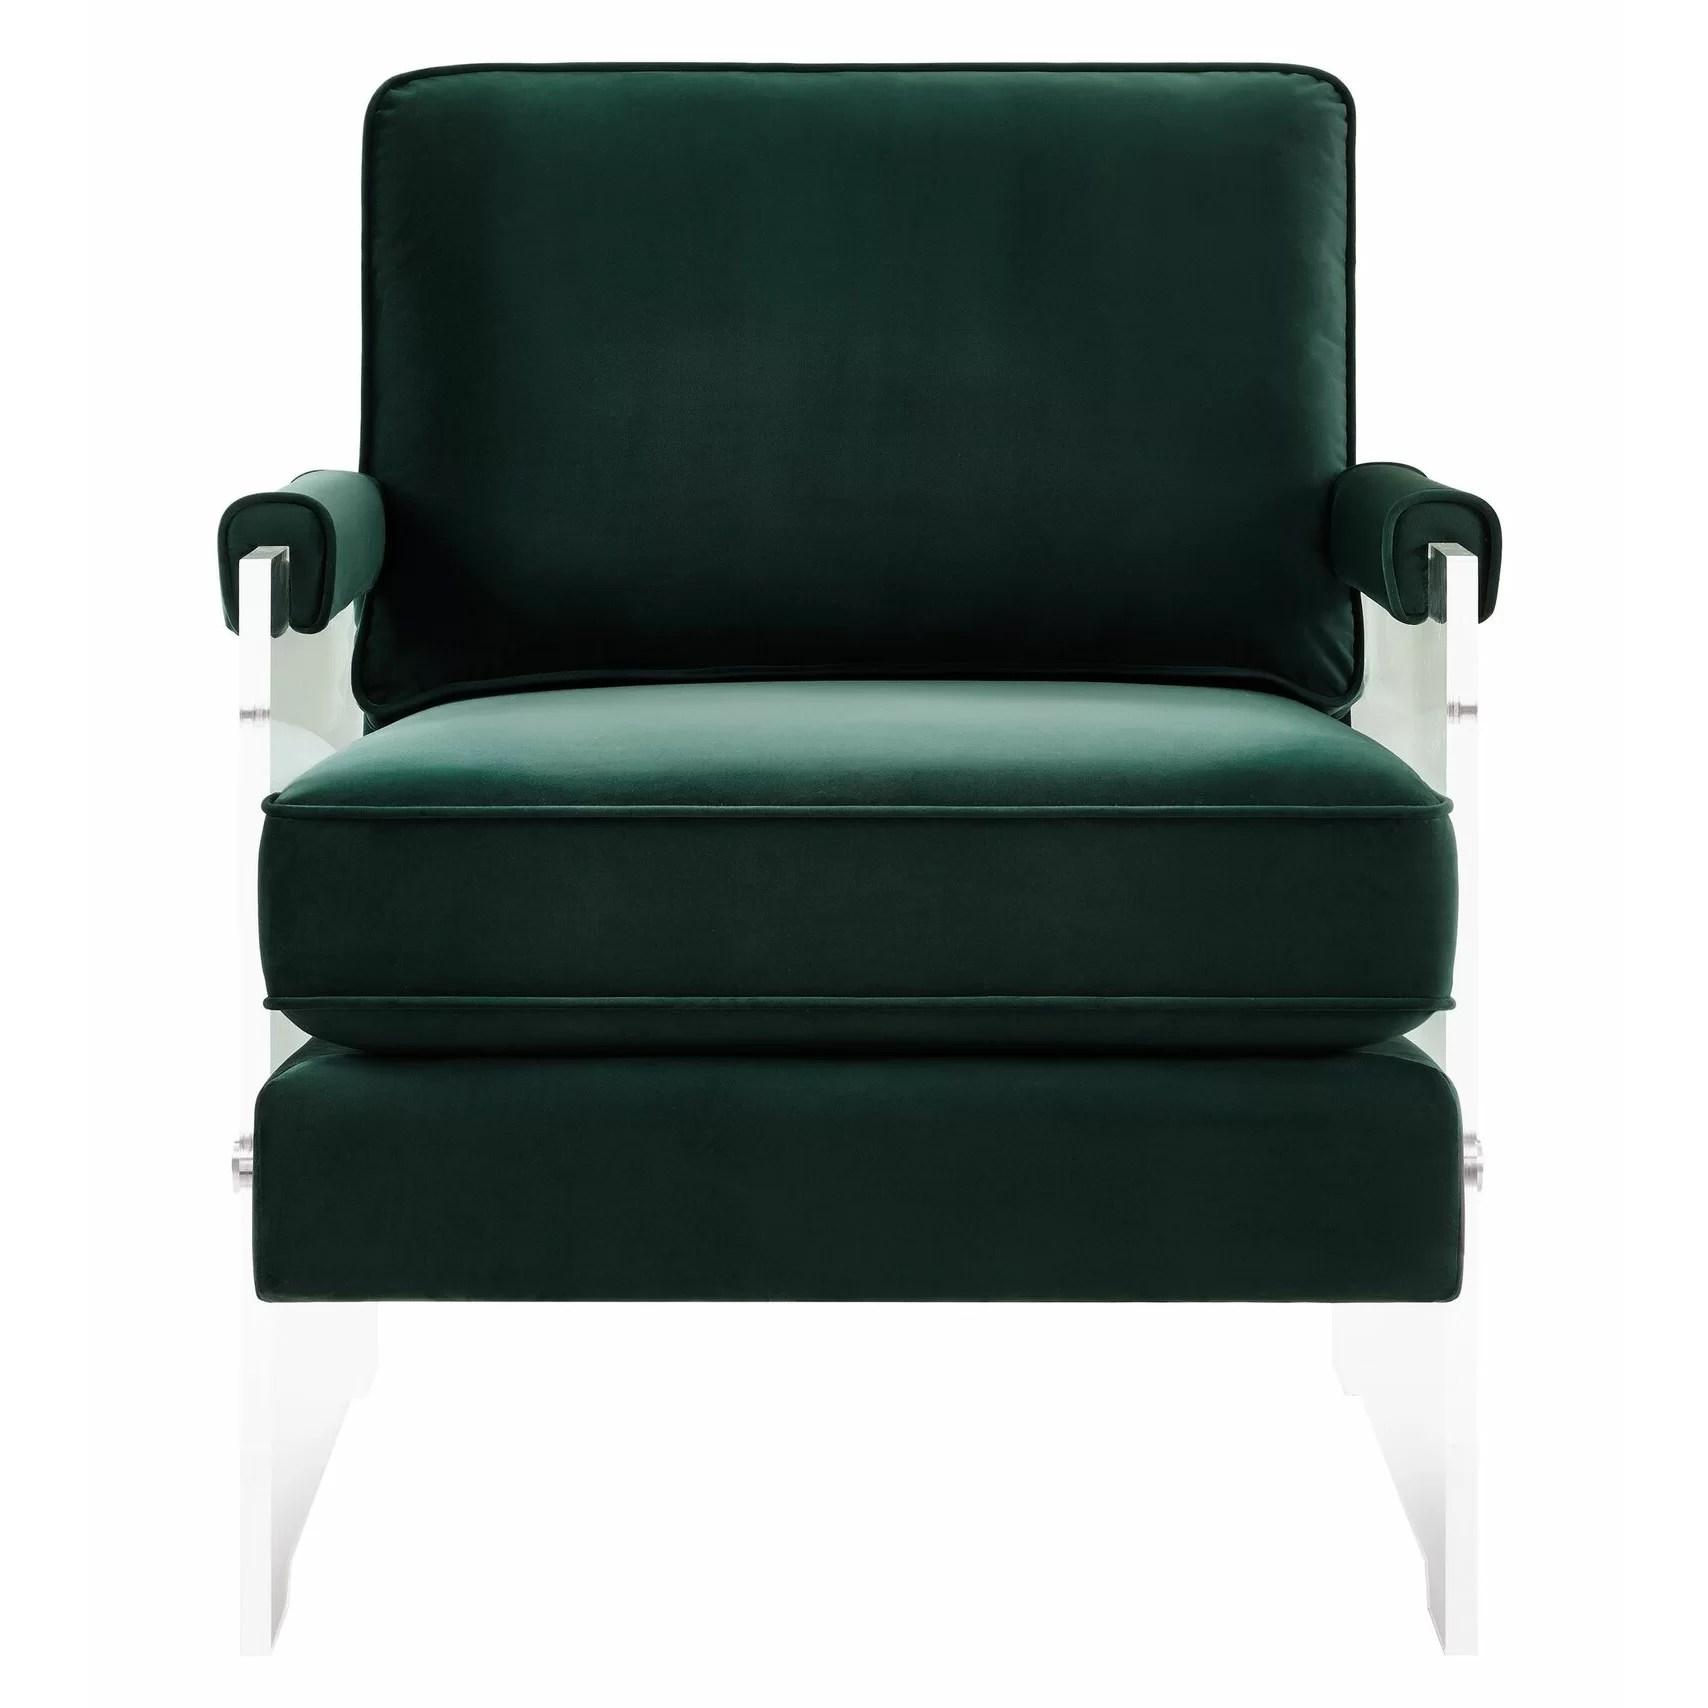 acrylic arm chair bean bag with built in blanket and pillow mercer41 dore velvet lucite wayfair